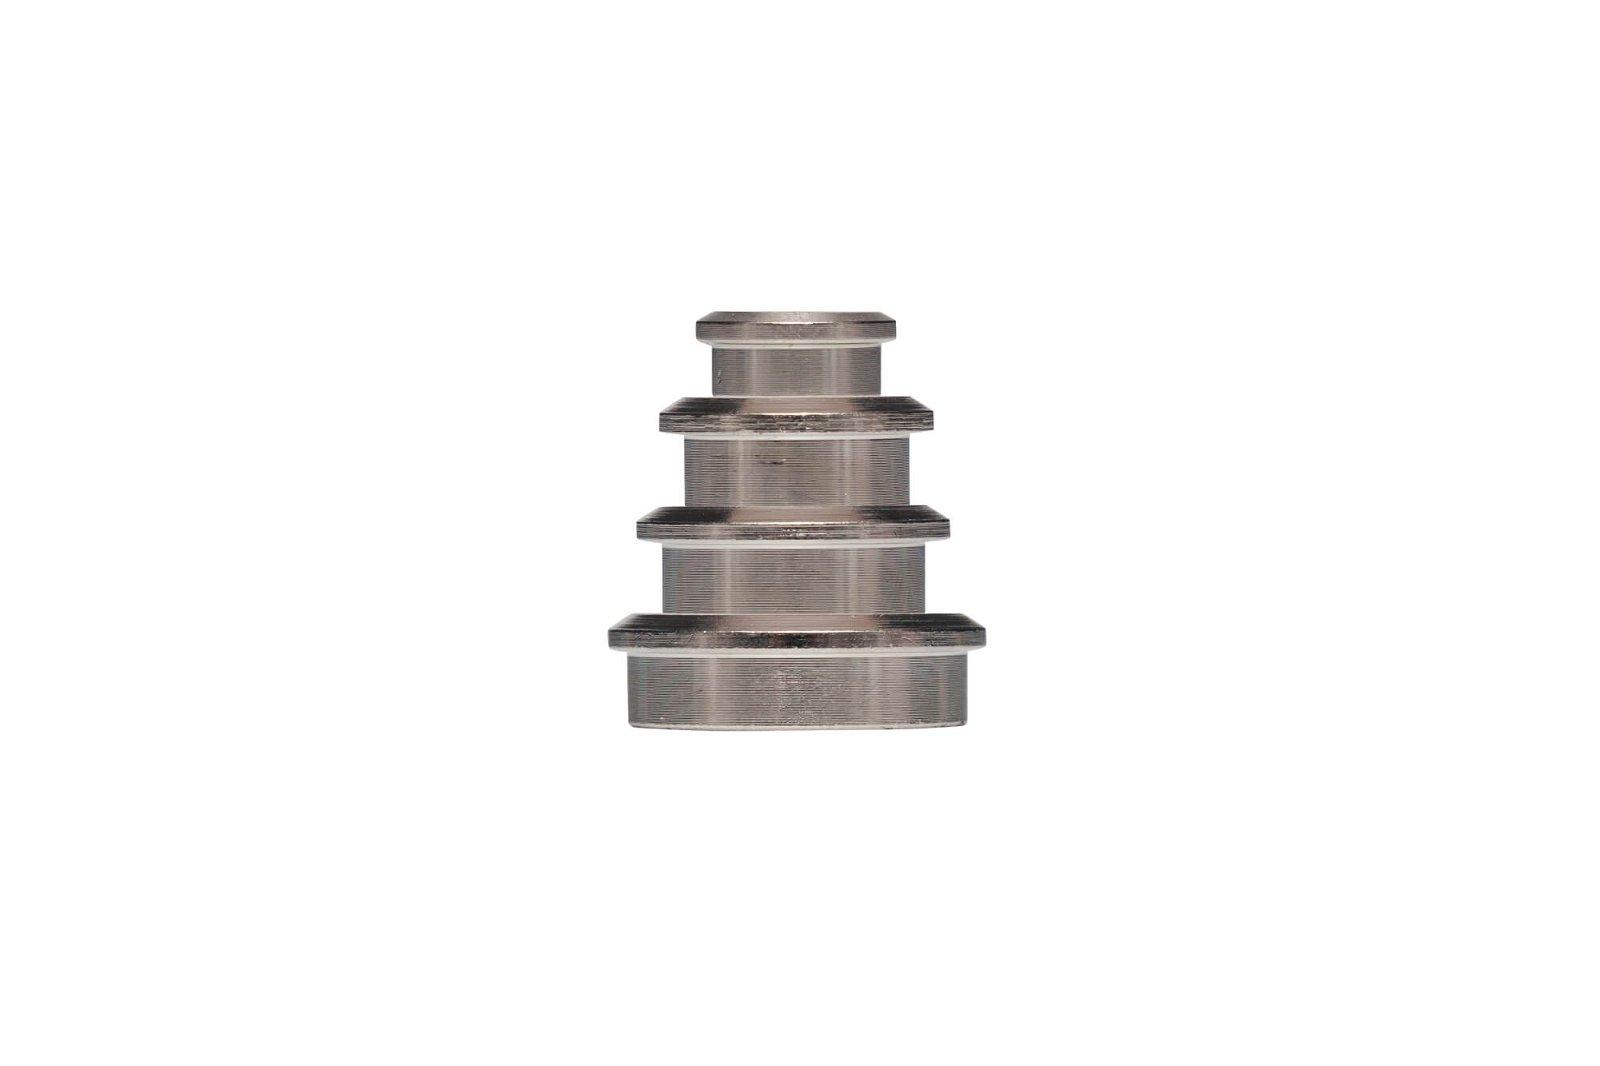 Neodym-Kraftmagnet SB, Ø 16 mm - 5 kg